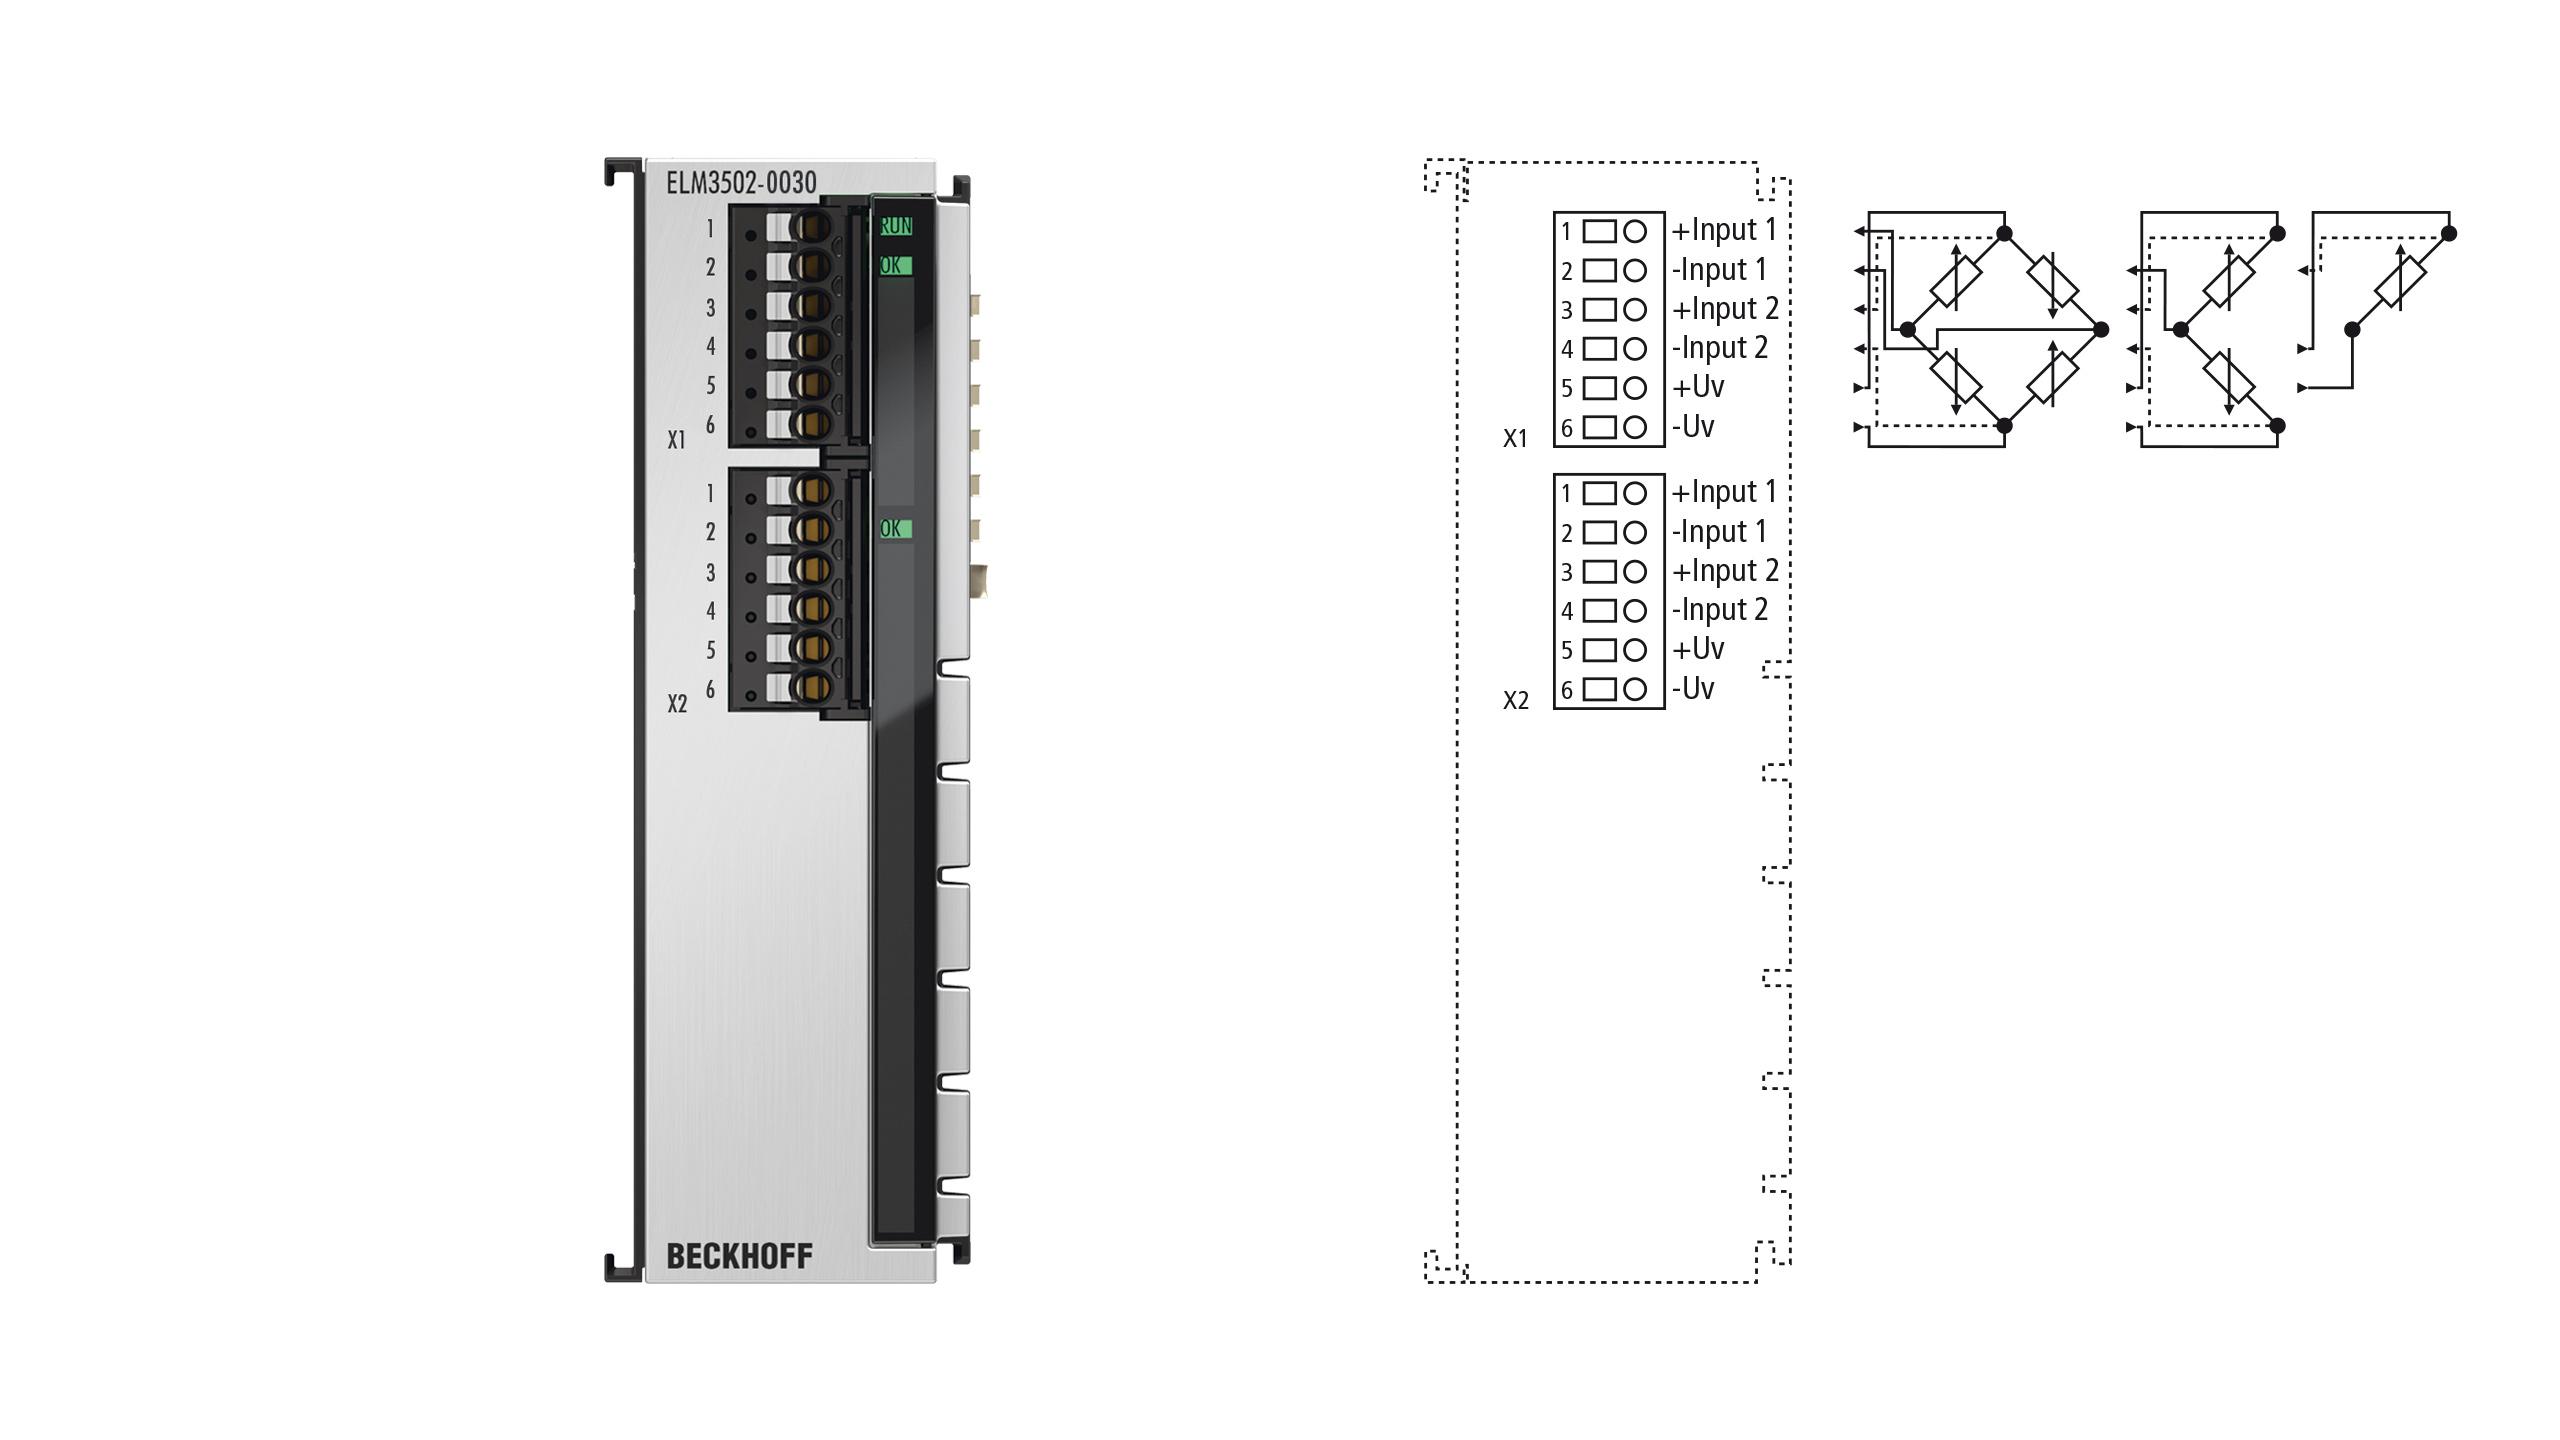 ELM3502-0030 | EtherCAT Terminal, 2-channel analog input, measuring bridge, full/half/quarterbridge, 24bit, 20ksps, externally calibrated